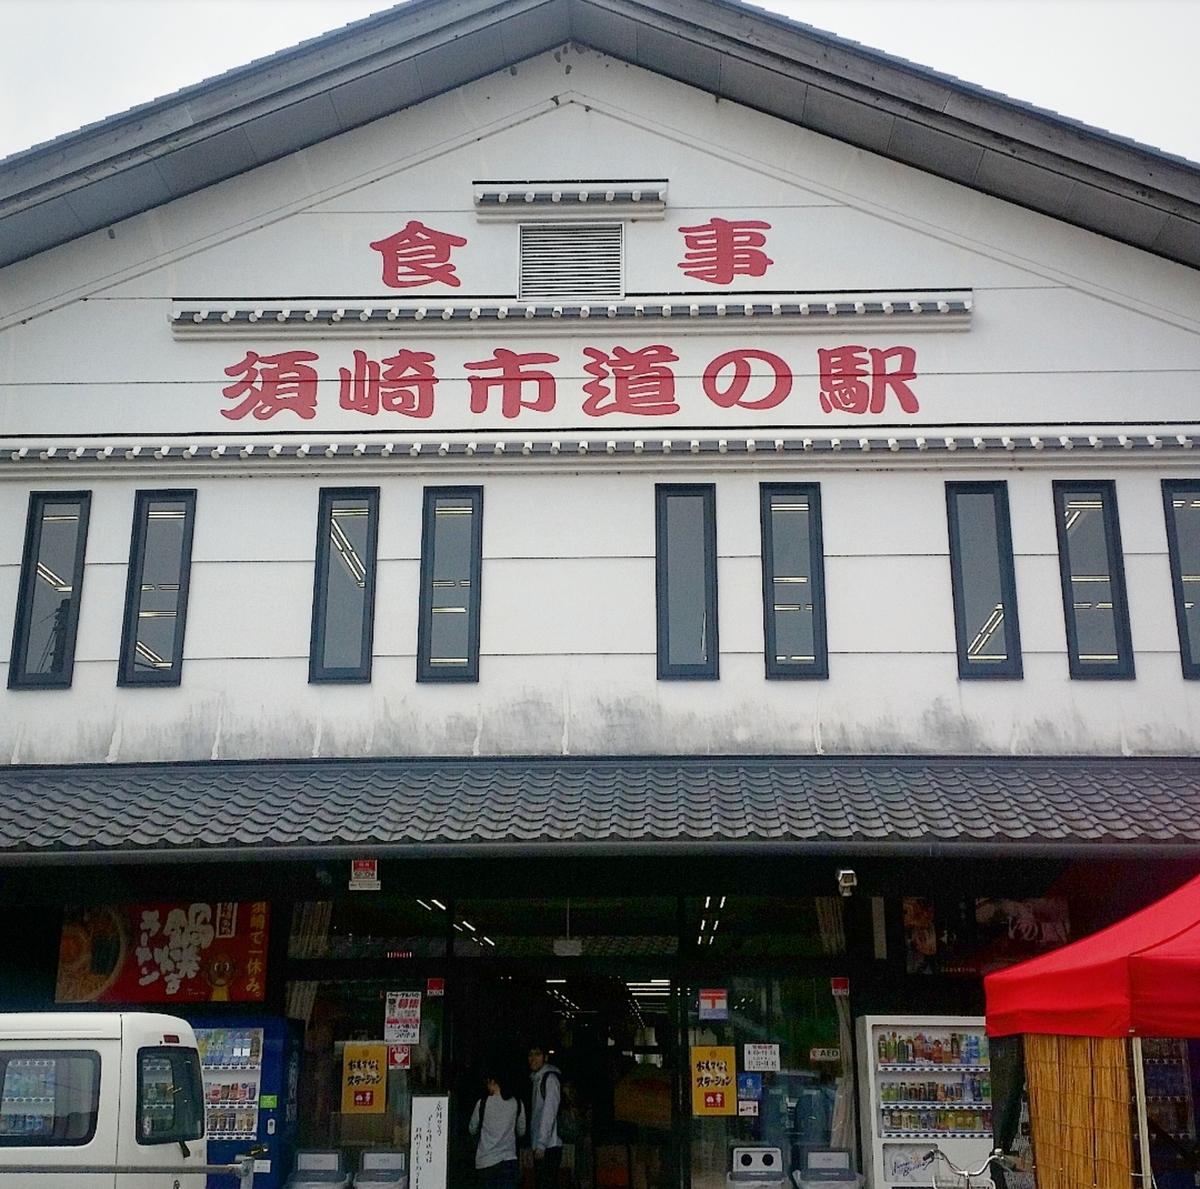 f:id:ichigo-ichie411211:20190506100643j:plain